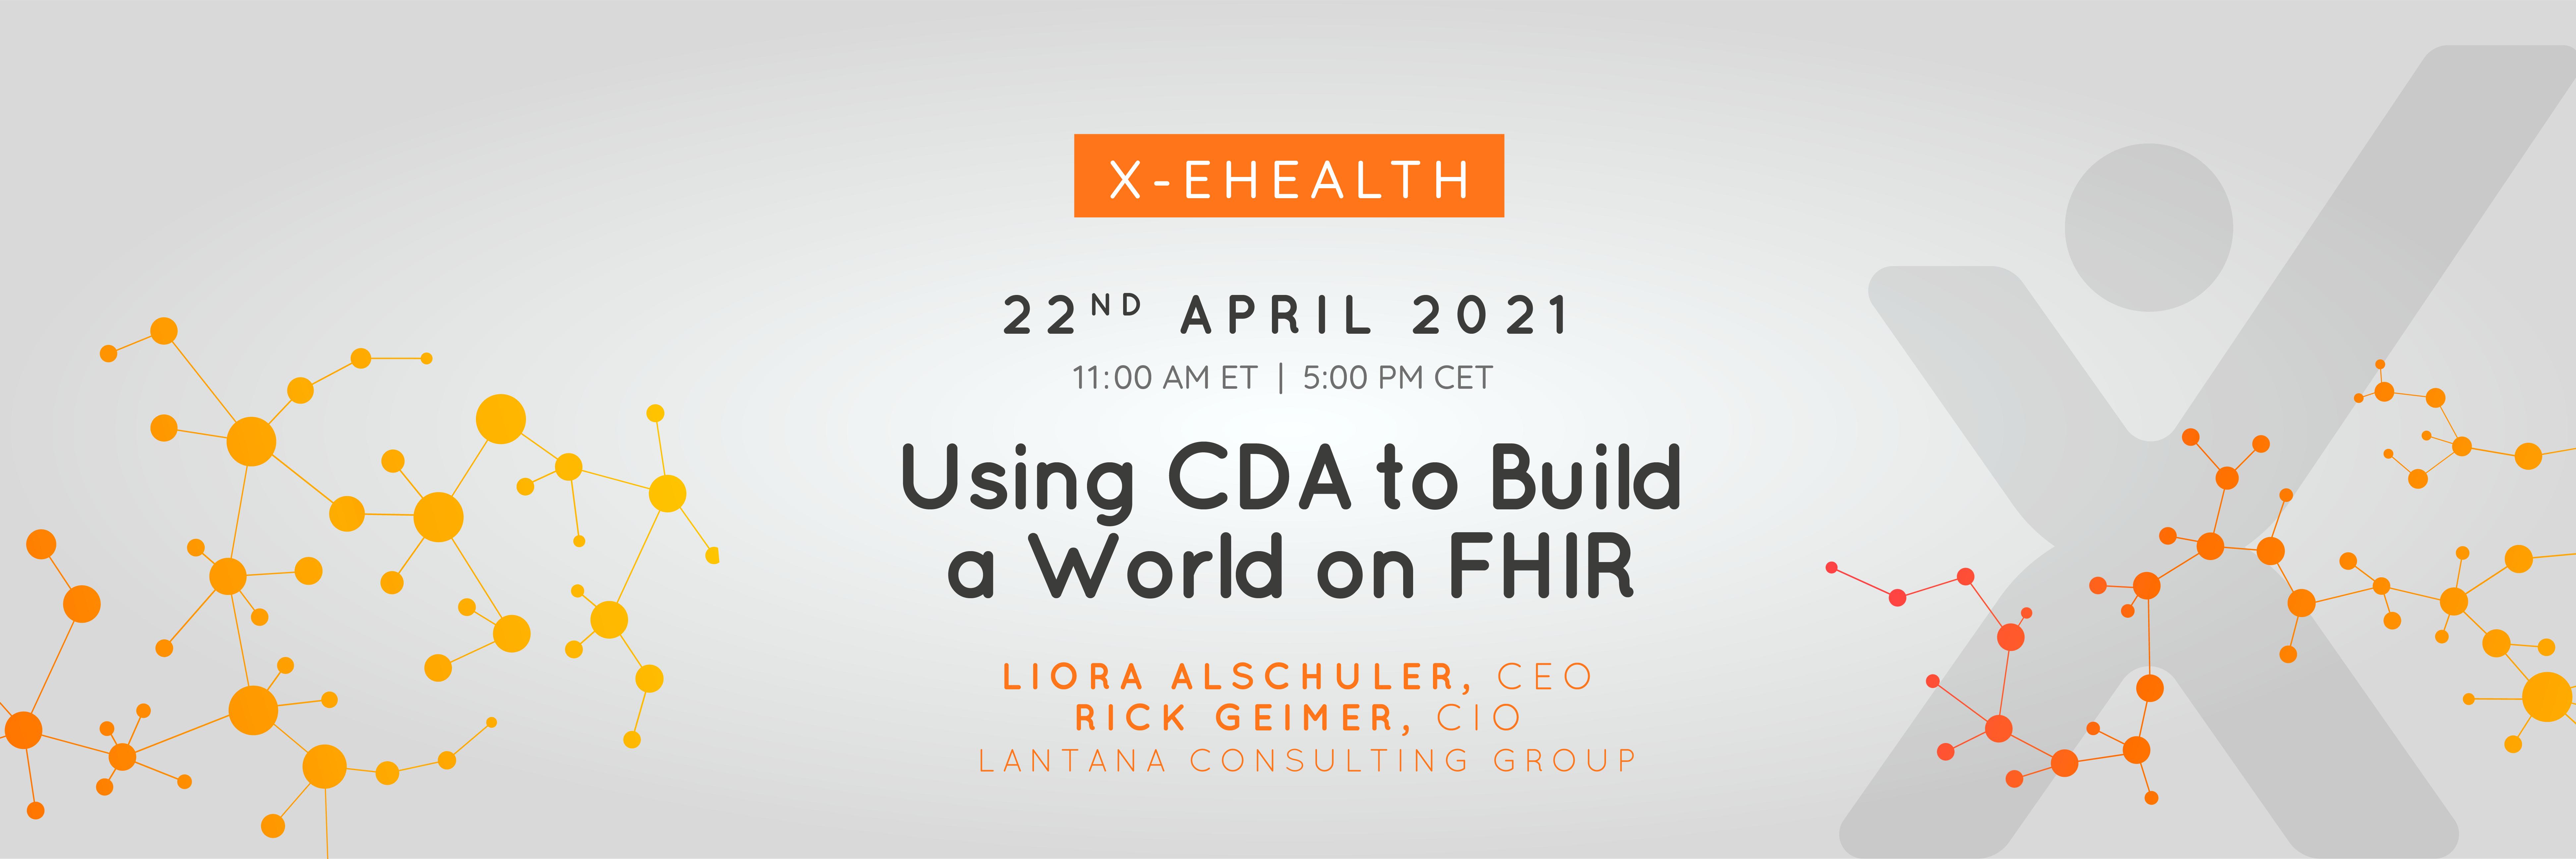 Using CDA do Build a World on FHIR new